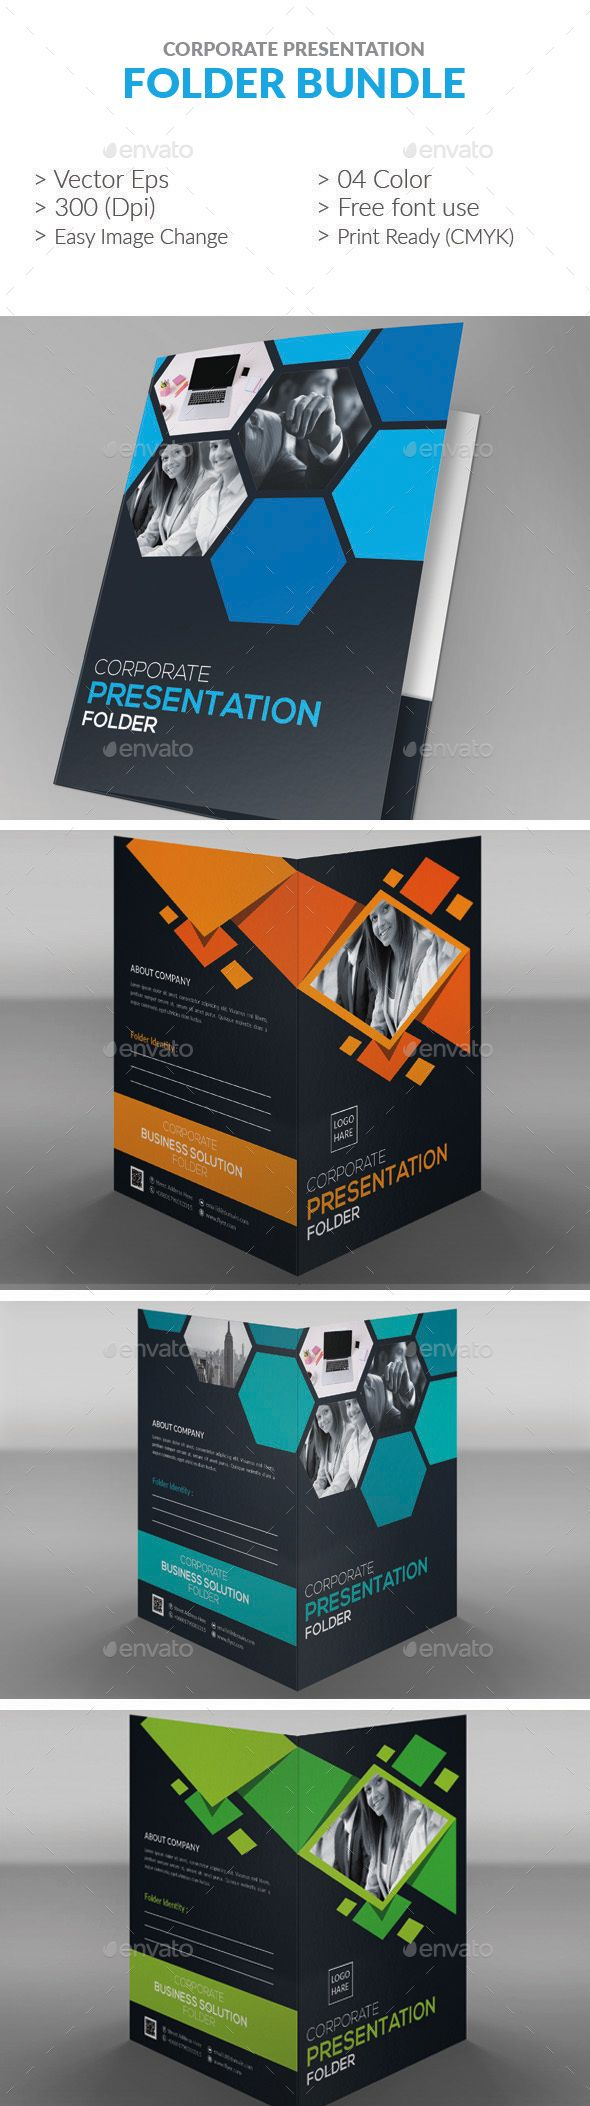 Presentation Folder Bundle - #Stationery #Print #Templates Download here: https://graphicriver.net/item/presentation-folder-bundle/19457921?ref=alena994